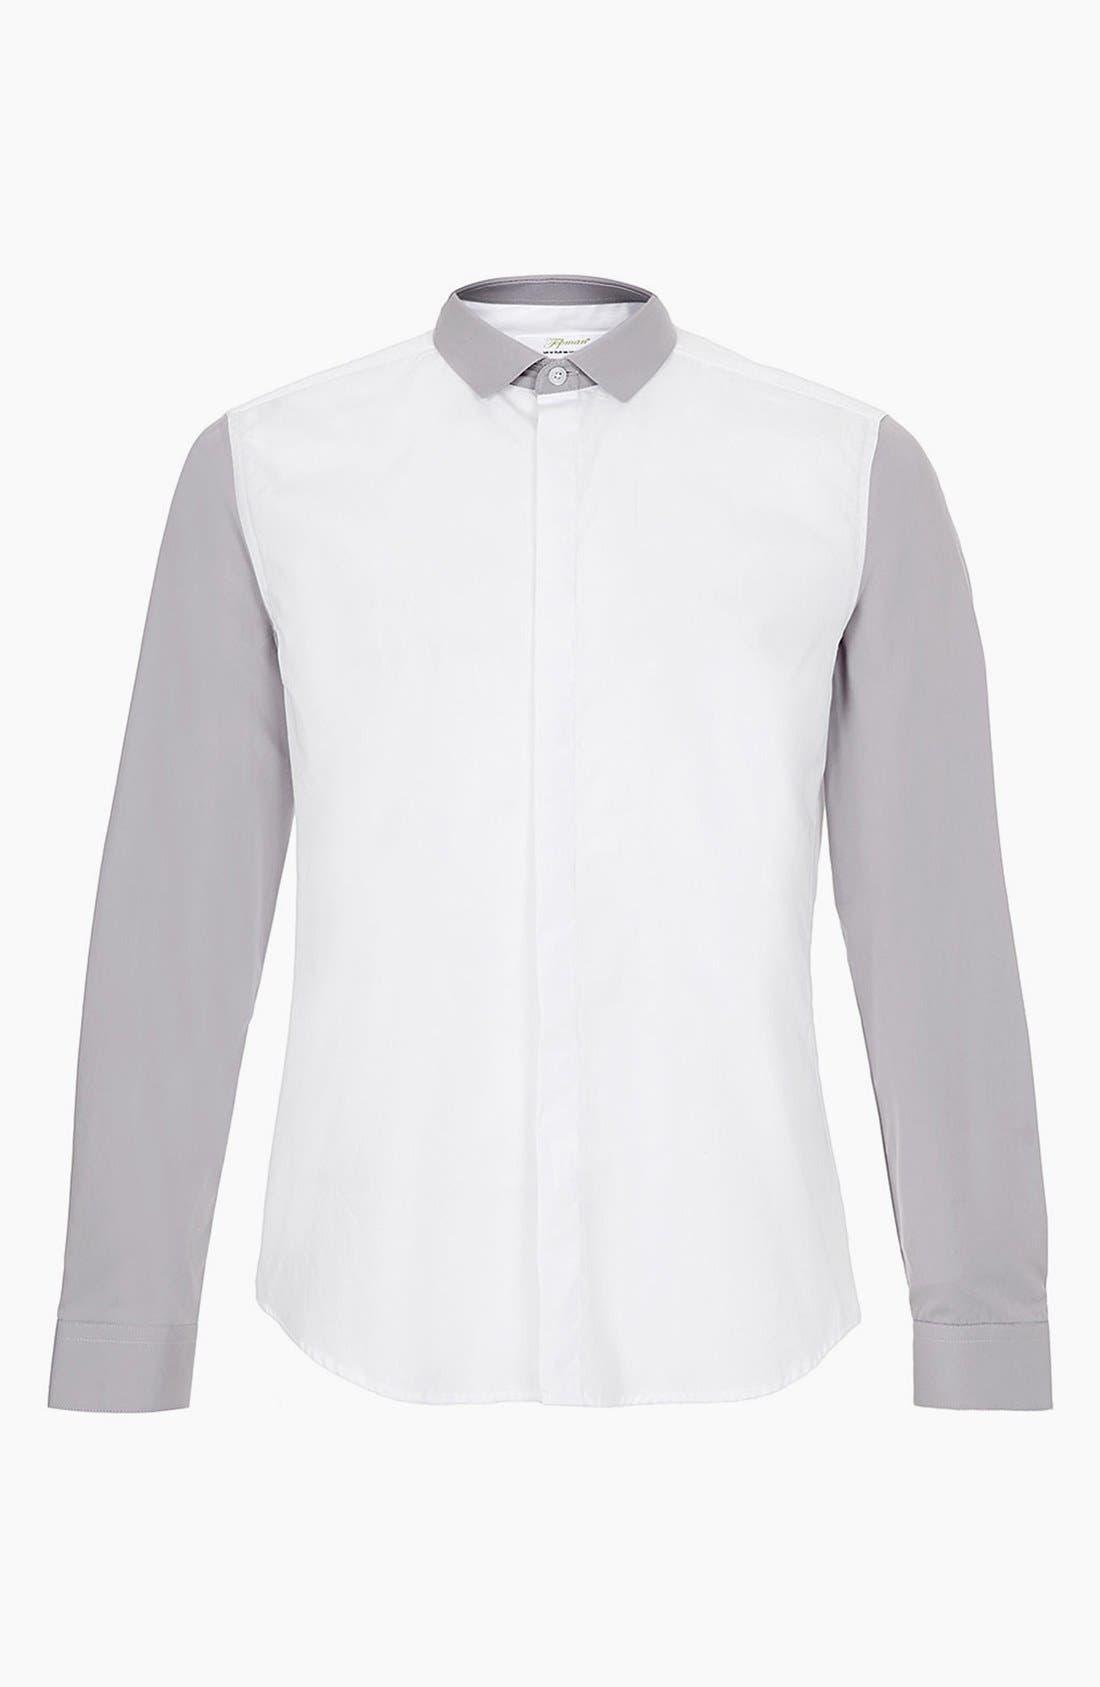 Alternate Image 1 Selected - Topman 'Smart' Extra Trim Contrast Dress Shirt